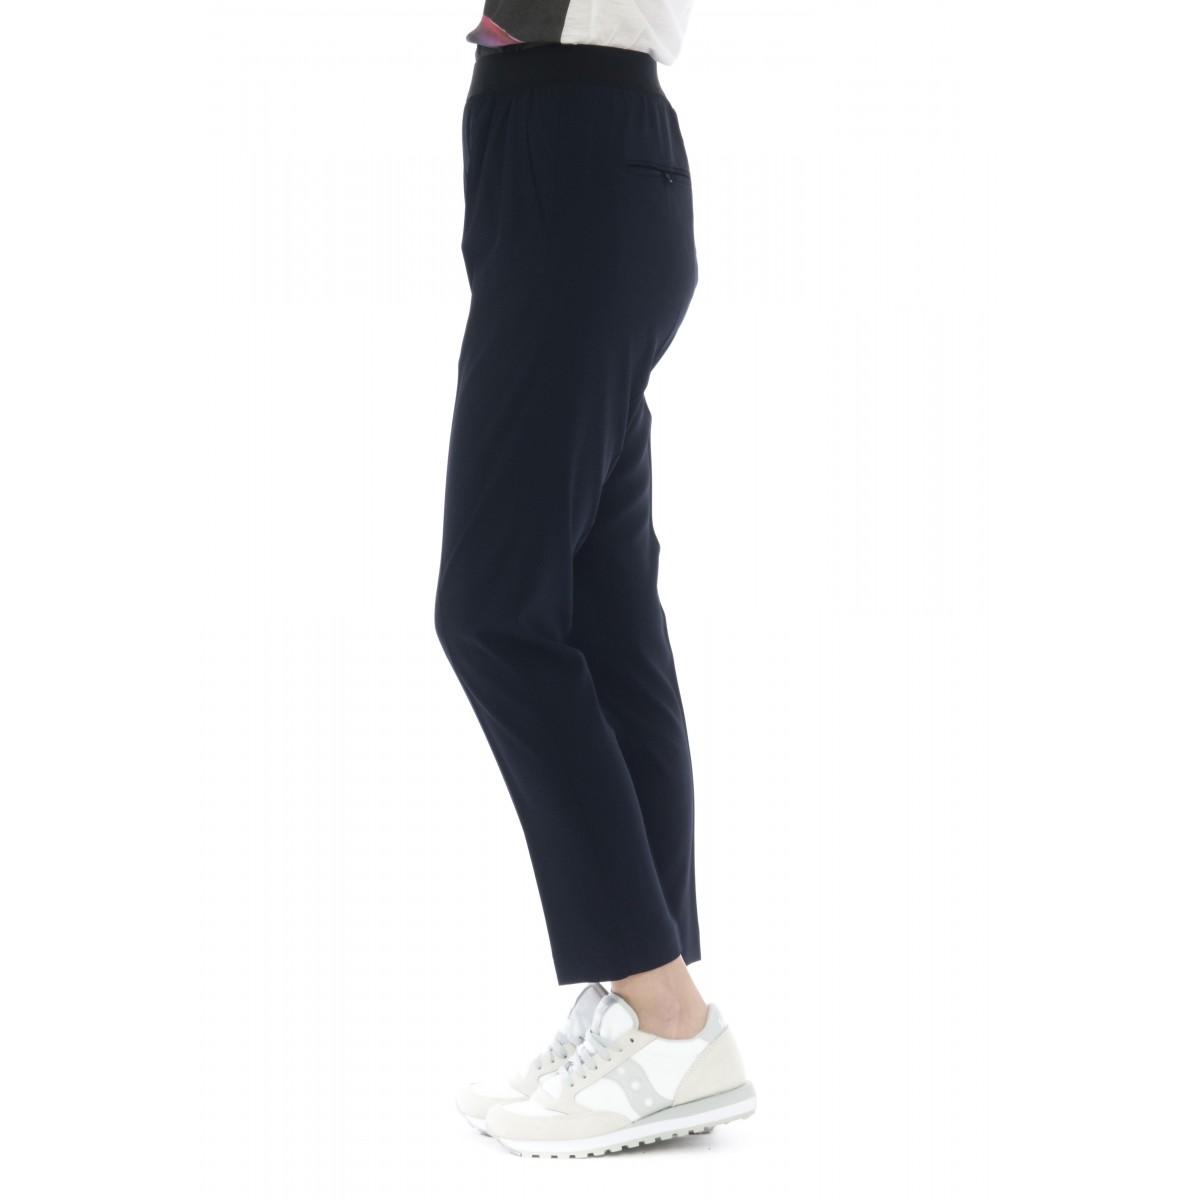 Pantalone donna - J4101 pantalone sigaretta elastico vito